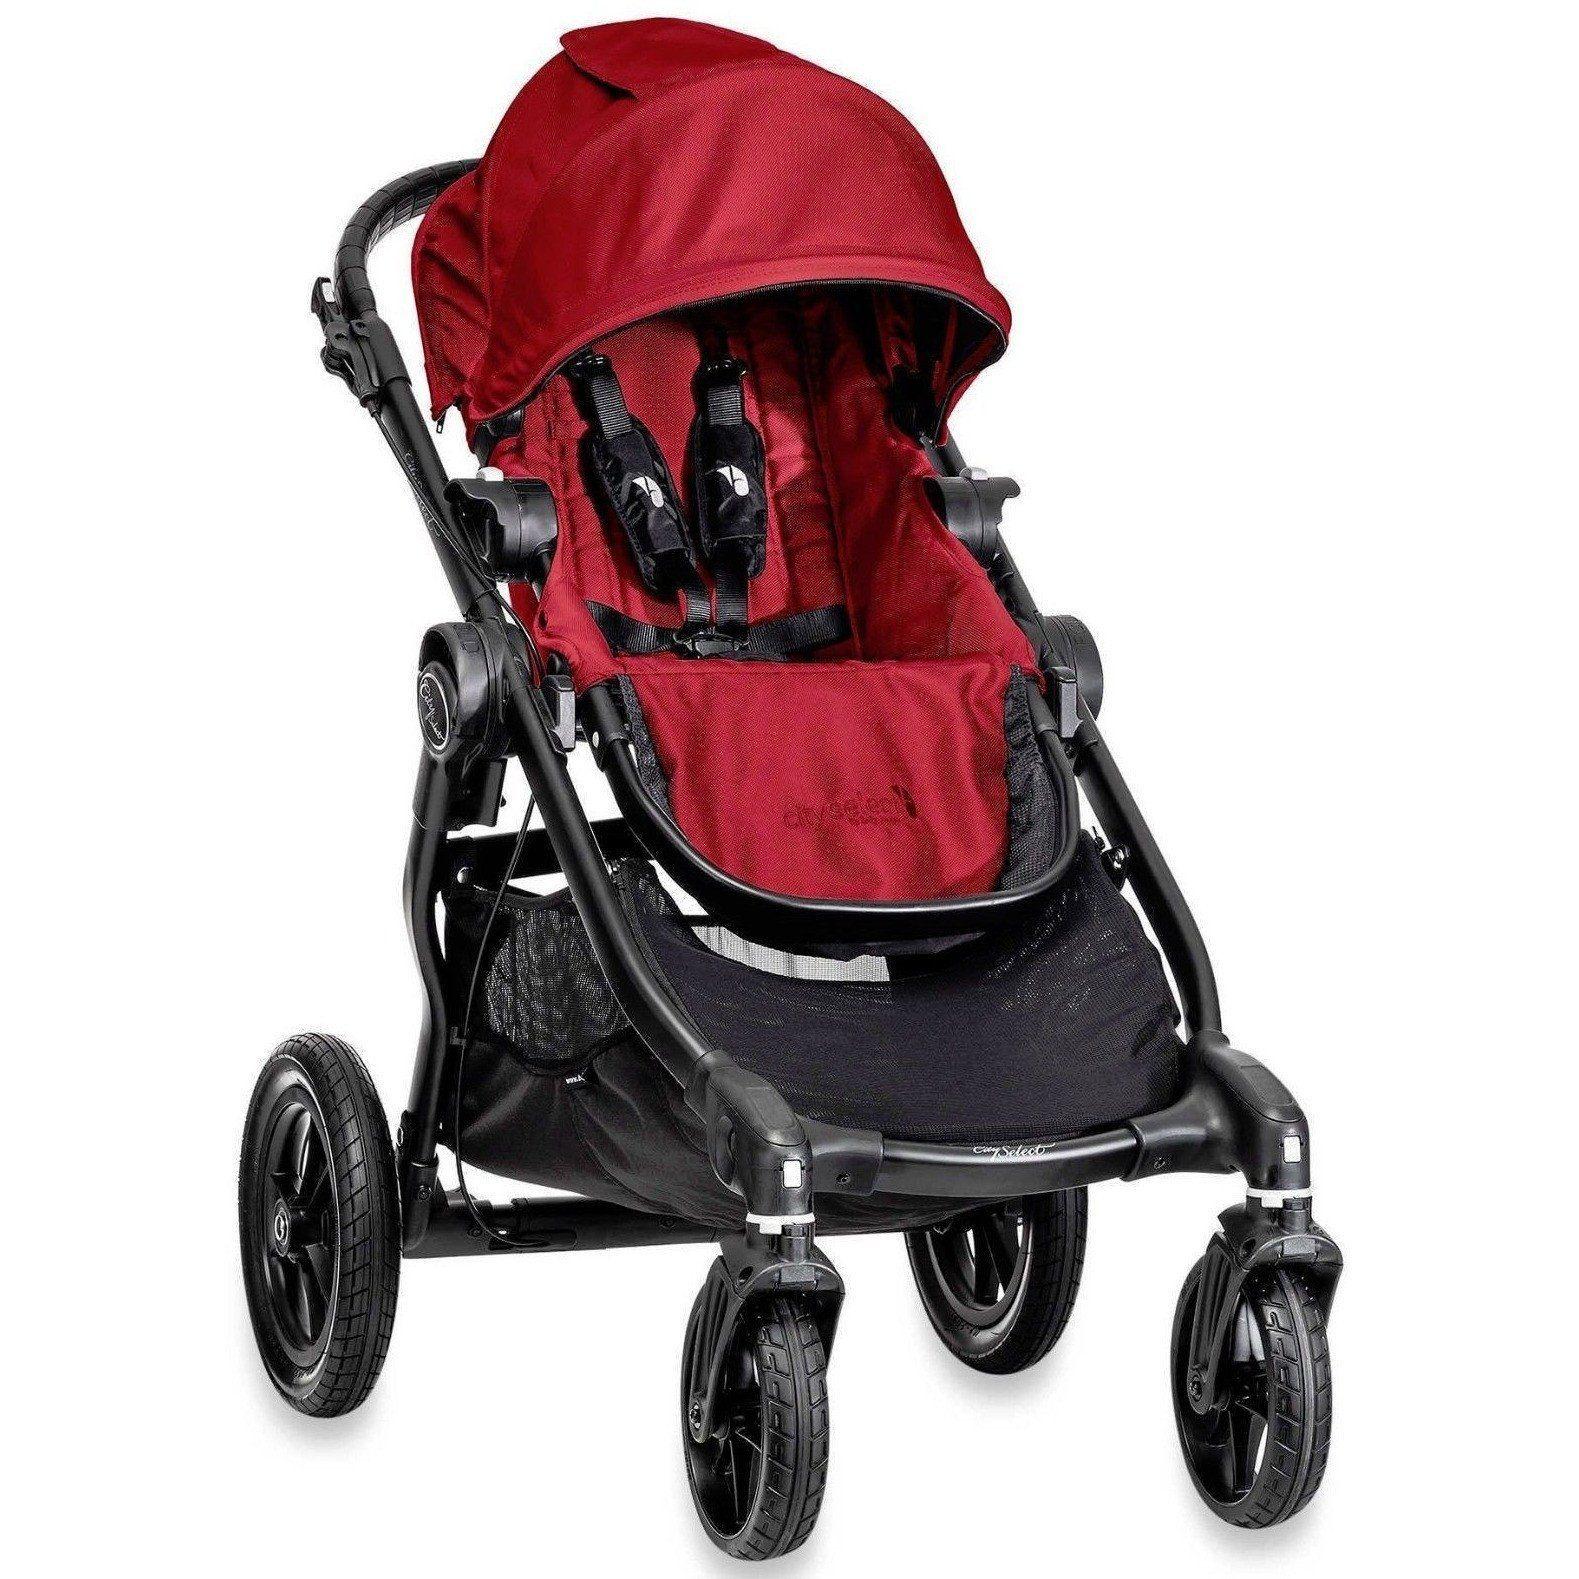 Baby Jogger City Select All Terrain Single Stroller Black